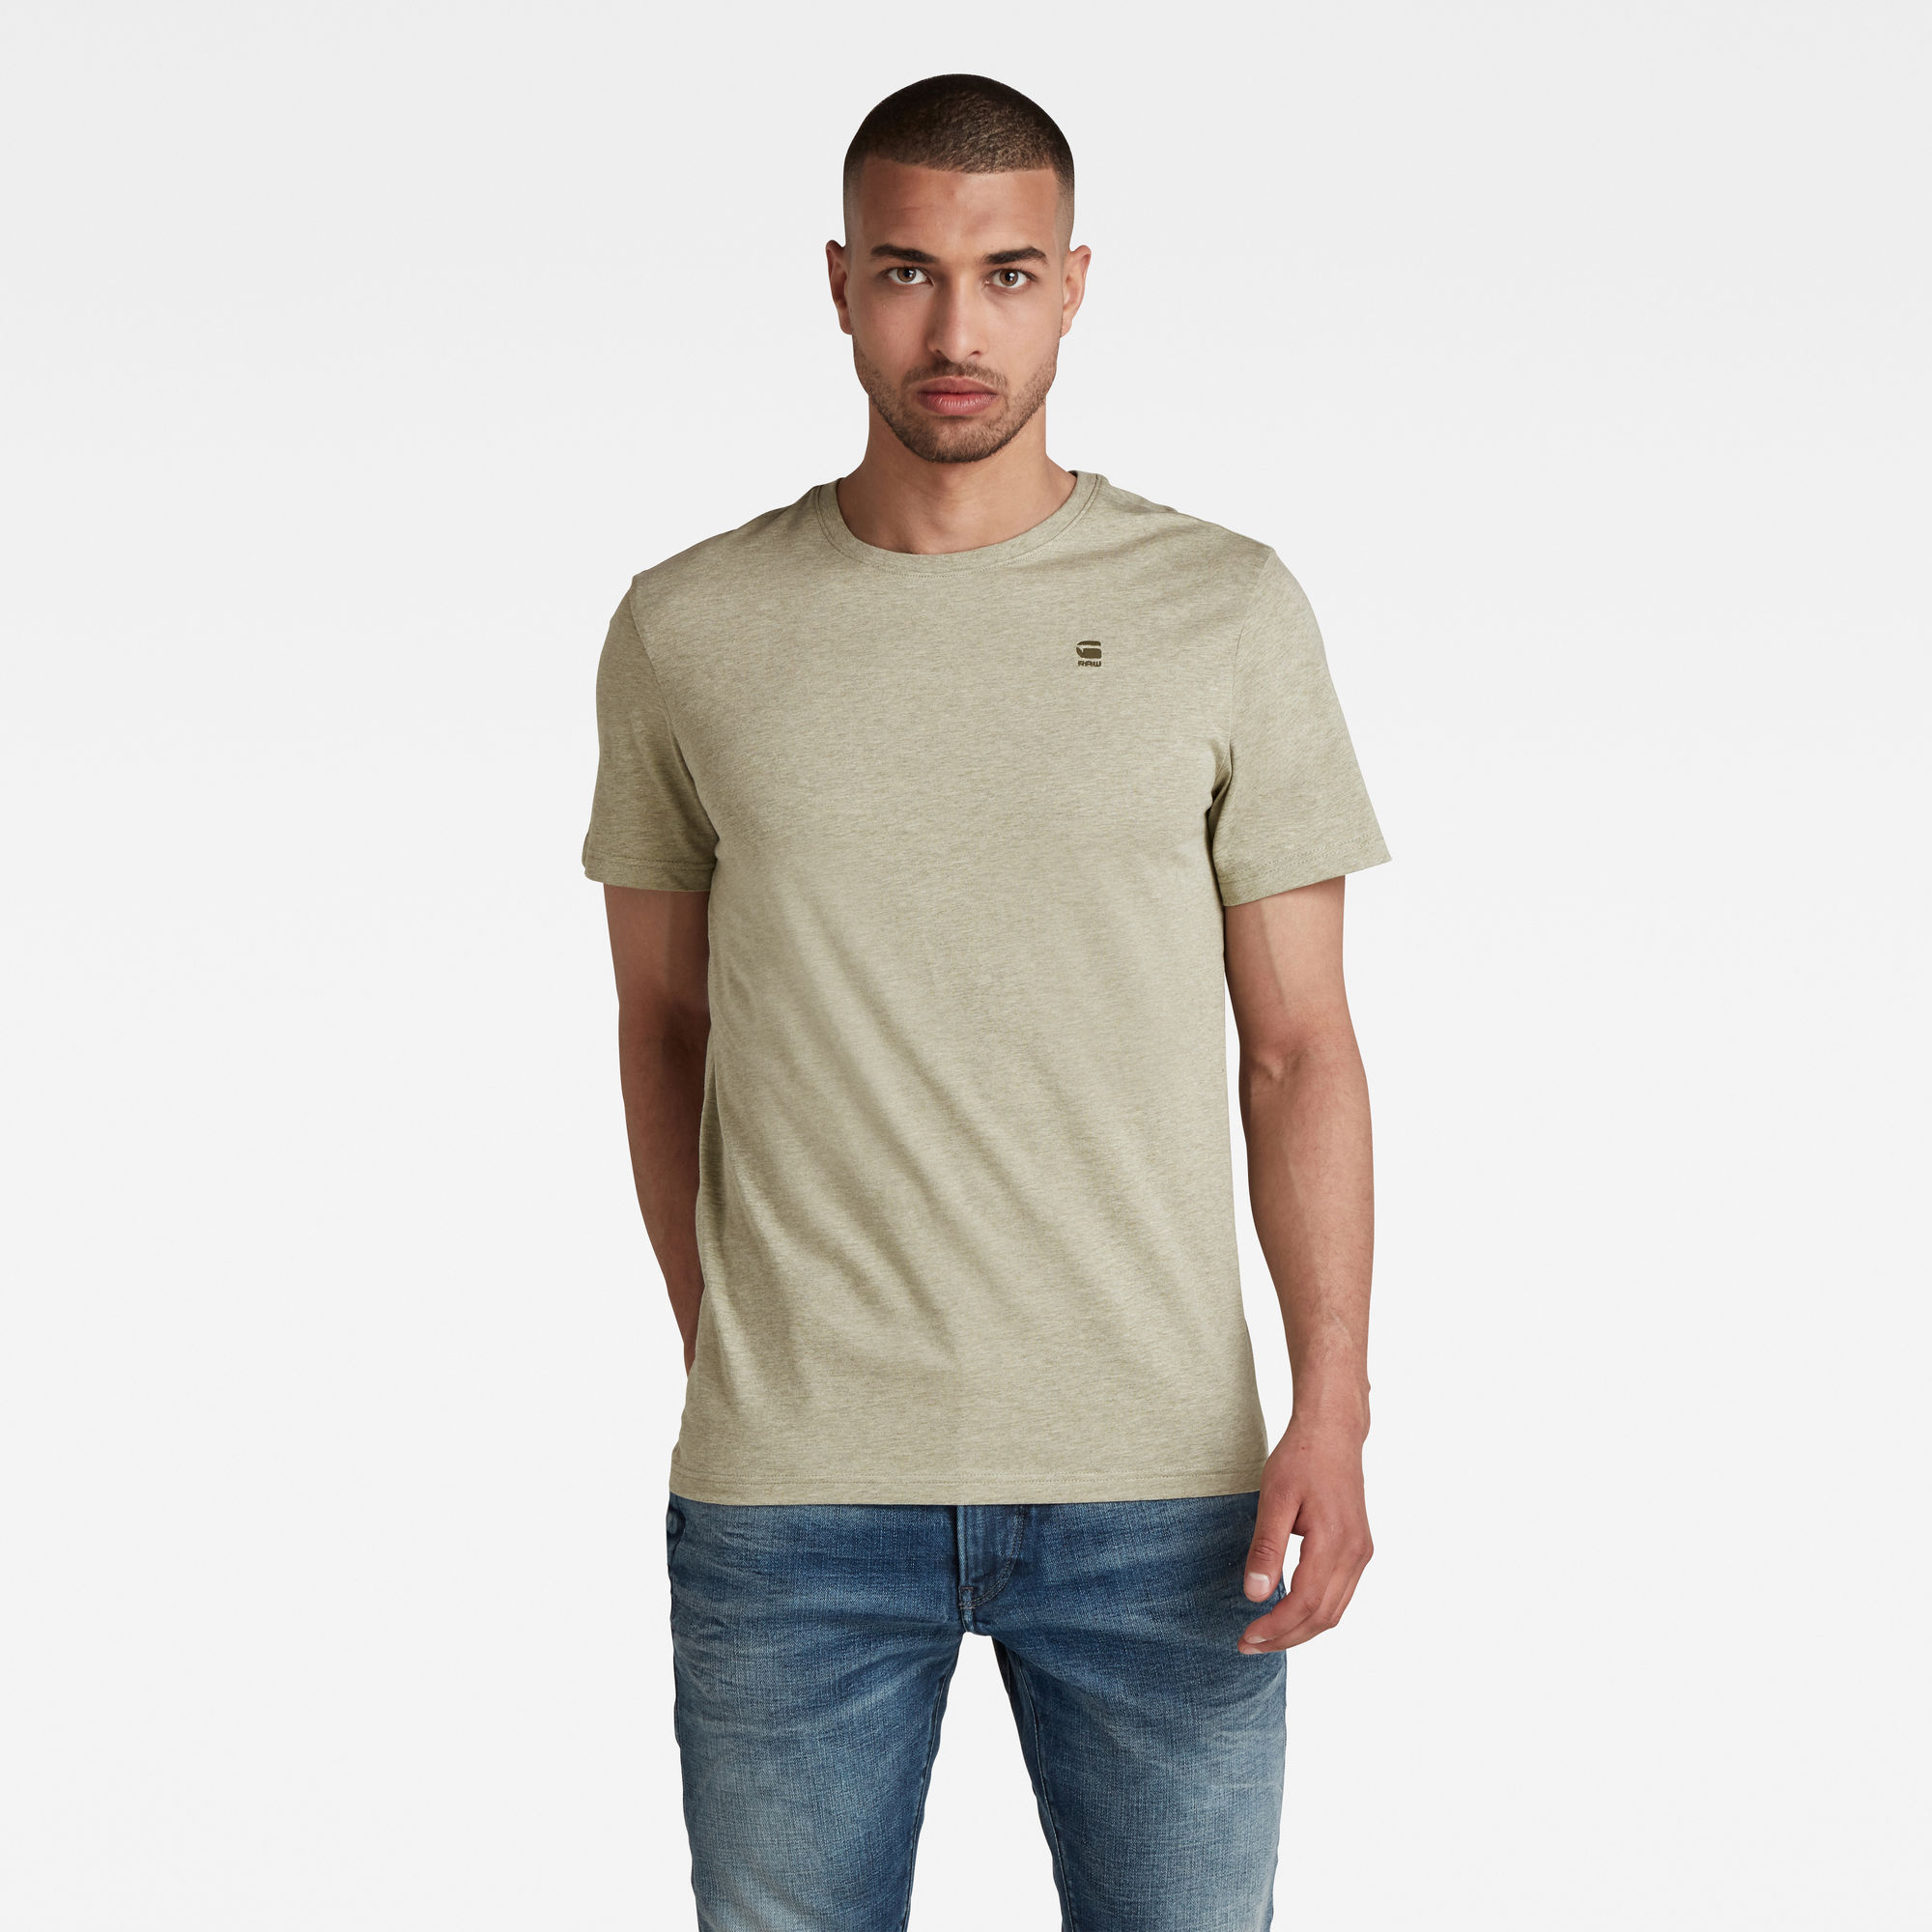 G-Star RAW Heren Base-S T-Shirt Meerkleurig